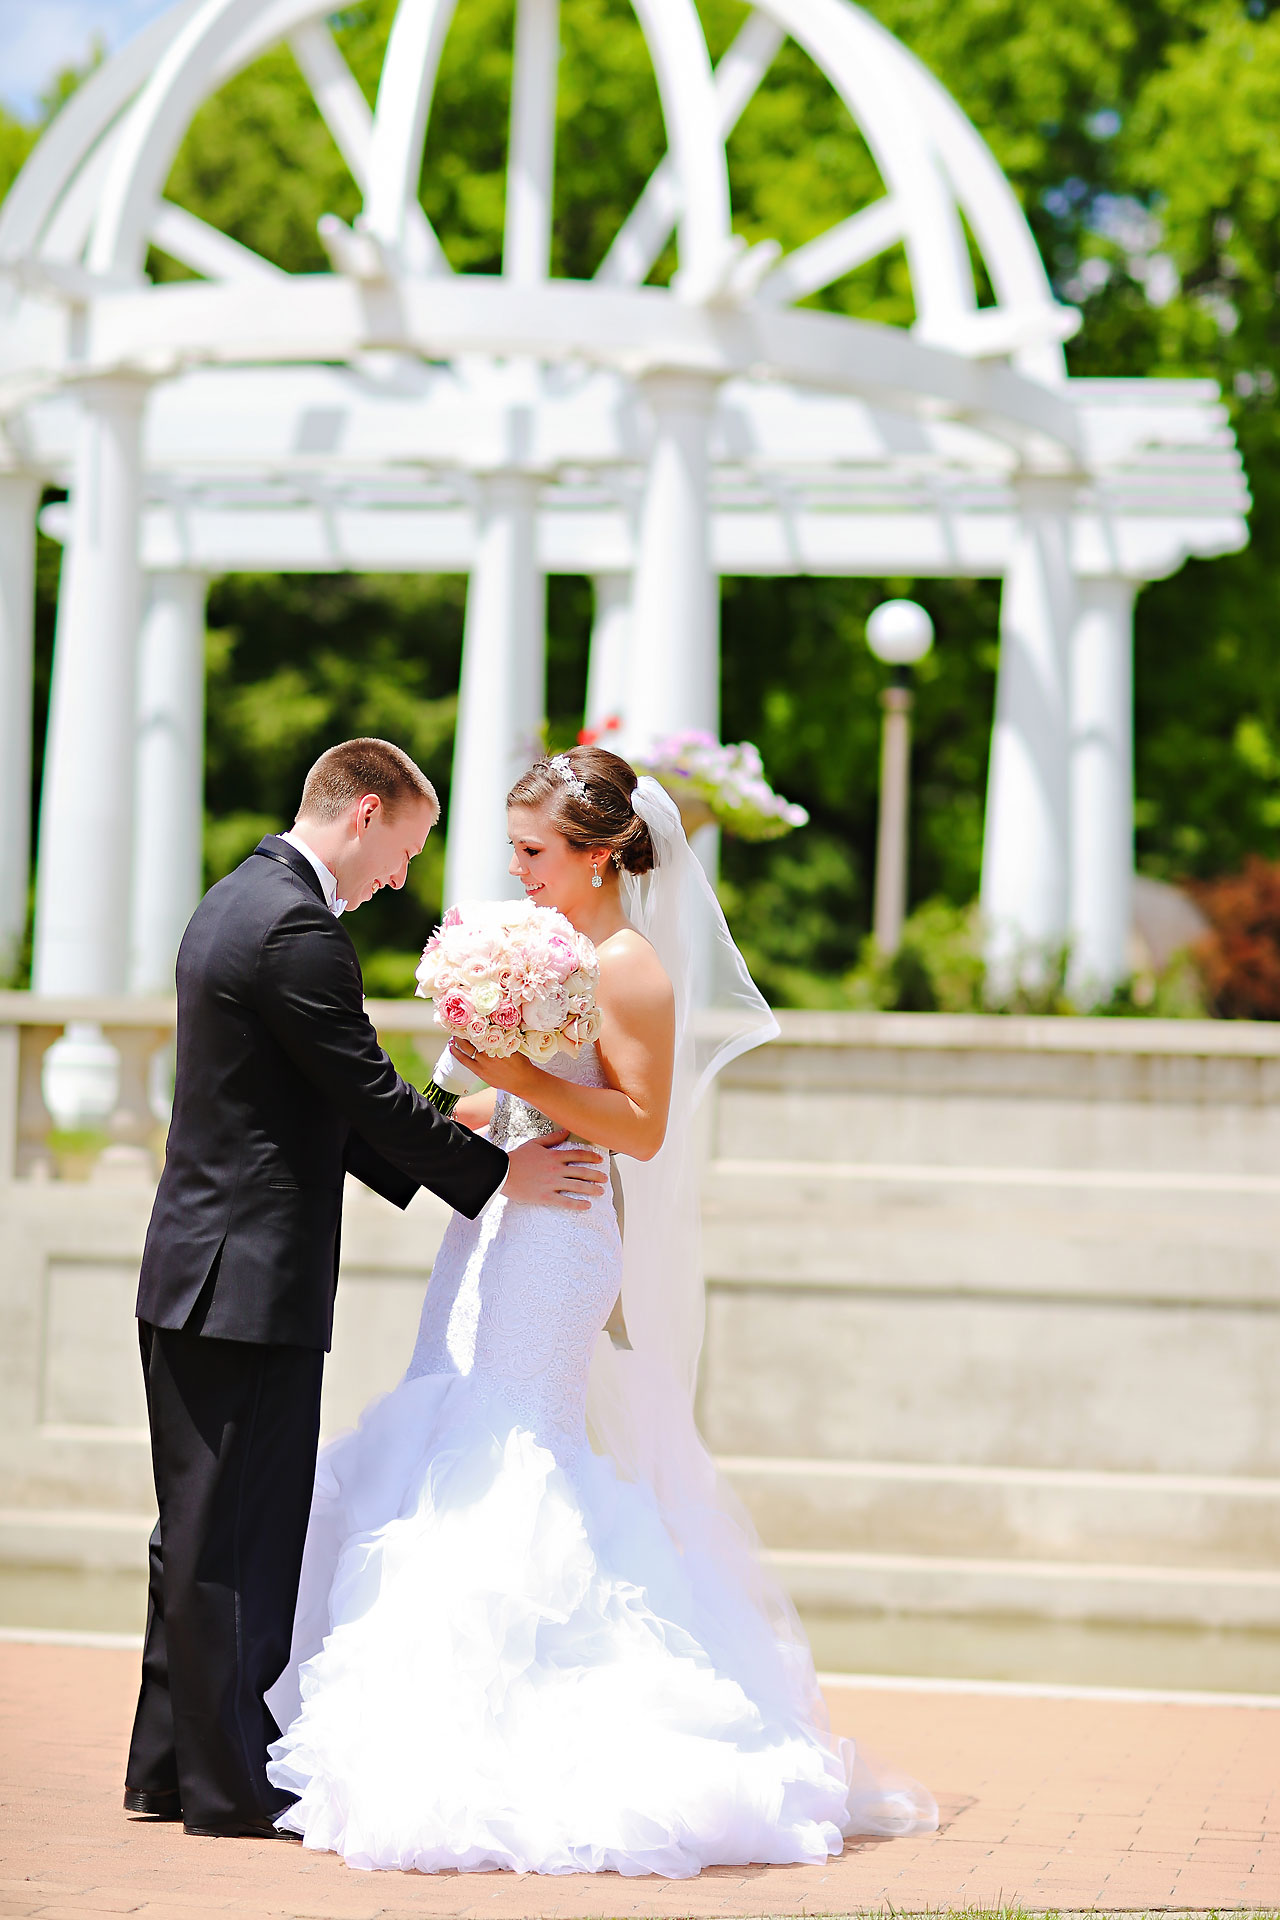 Emmy Benji Emyprean Fort Wayne Wedding 050